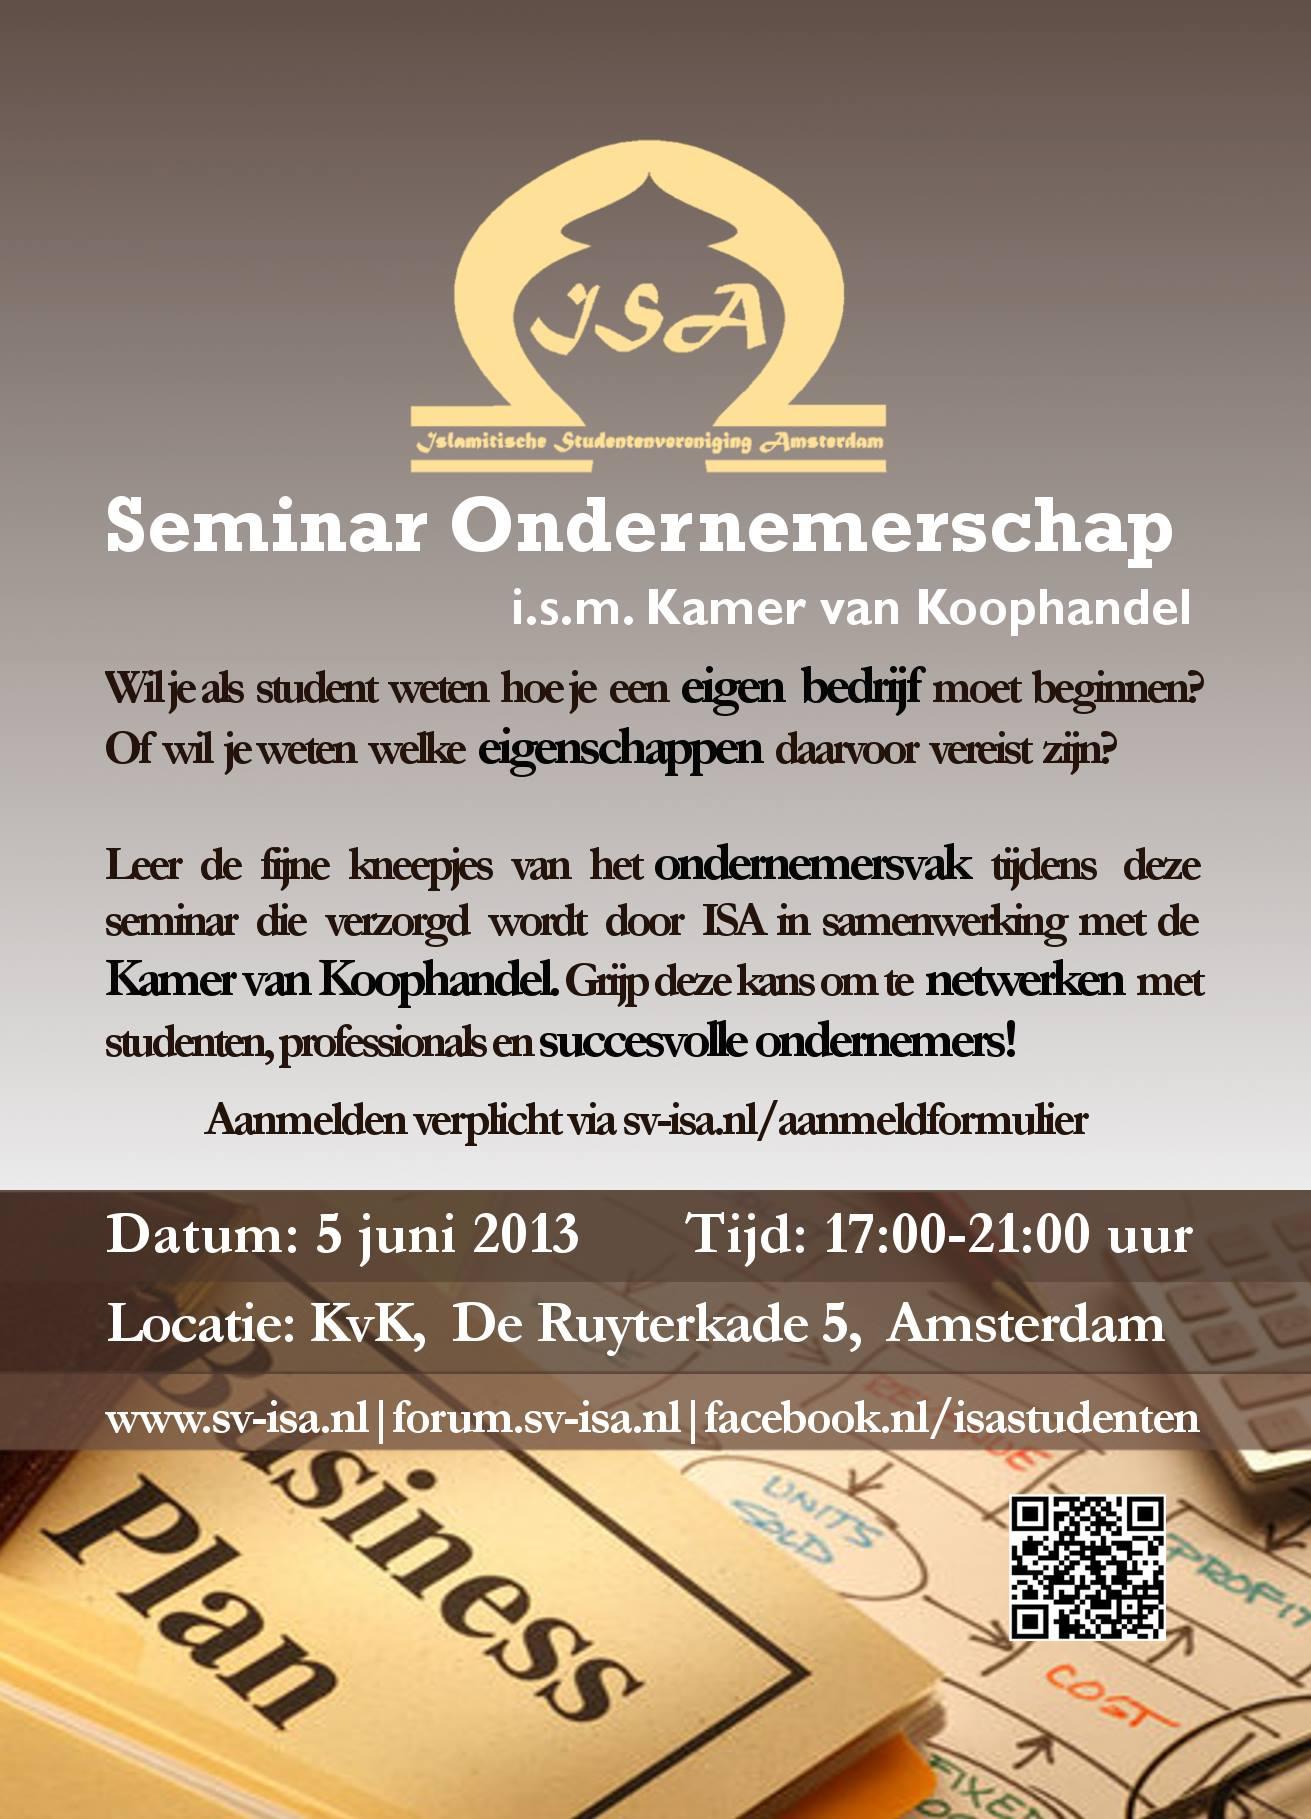 flyer-seminar-ondernemerschap